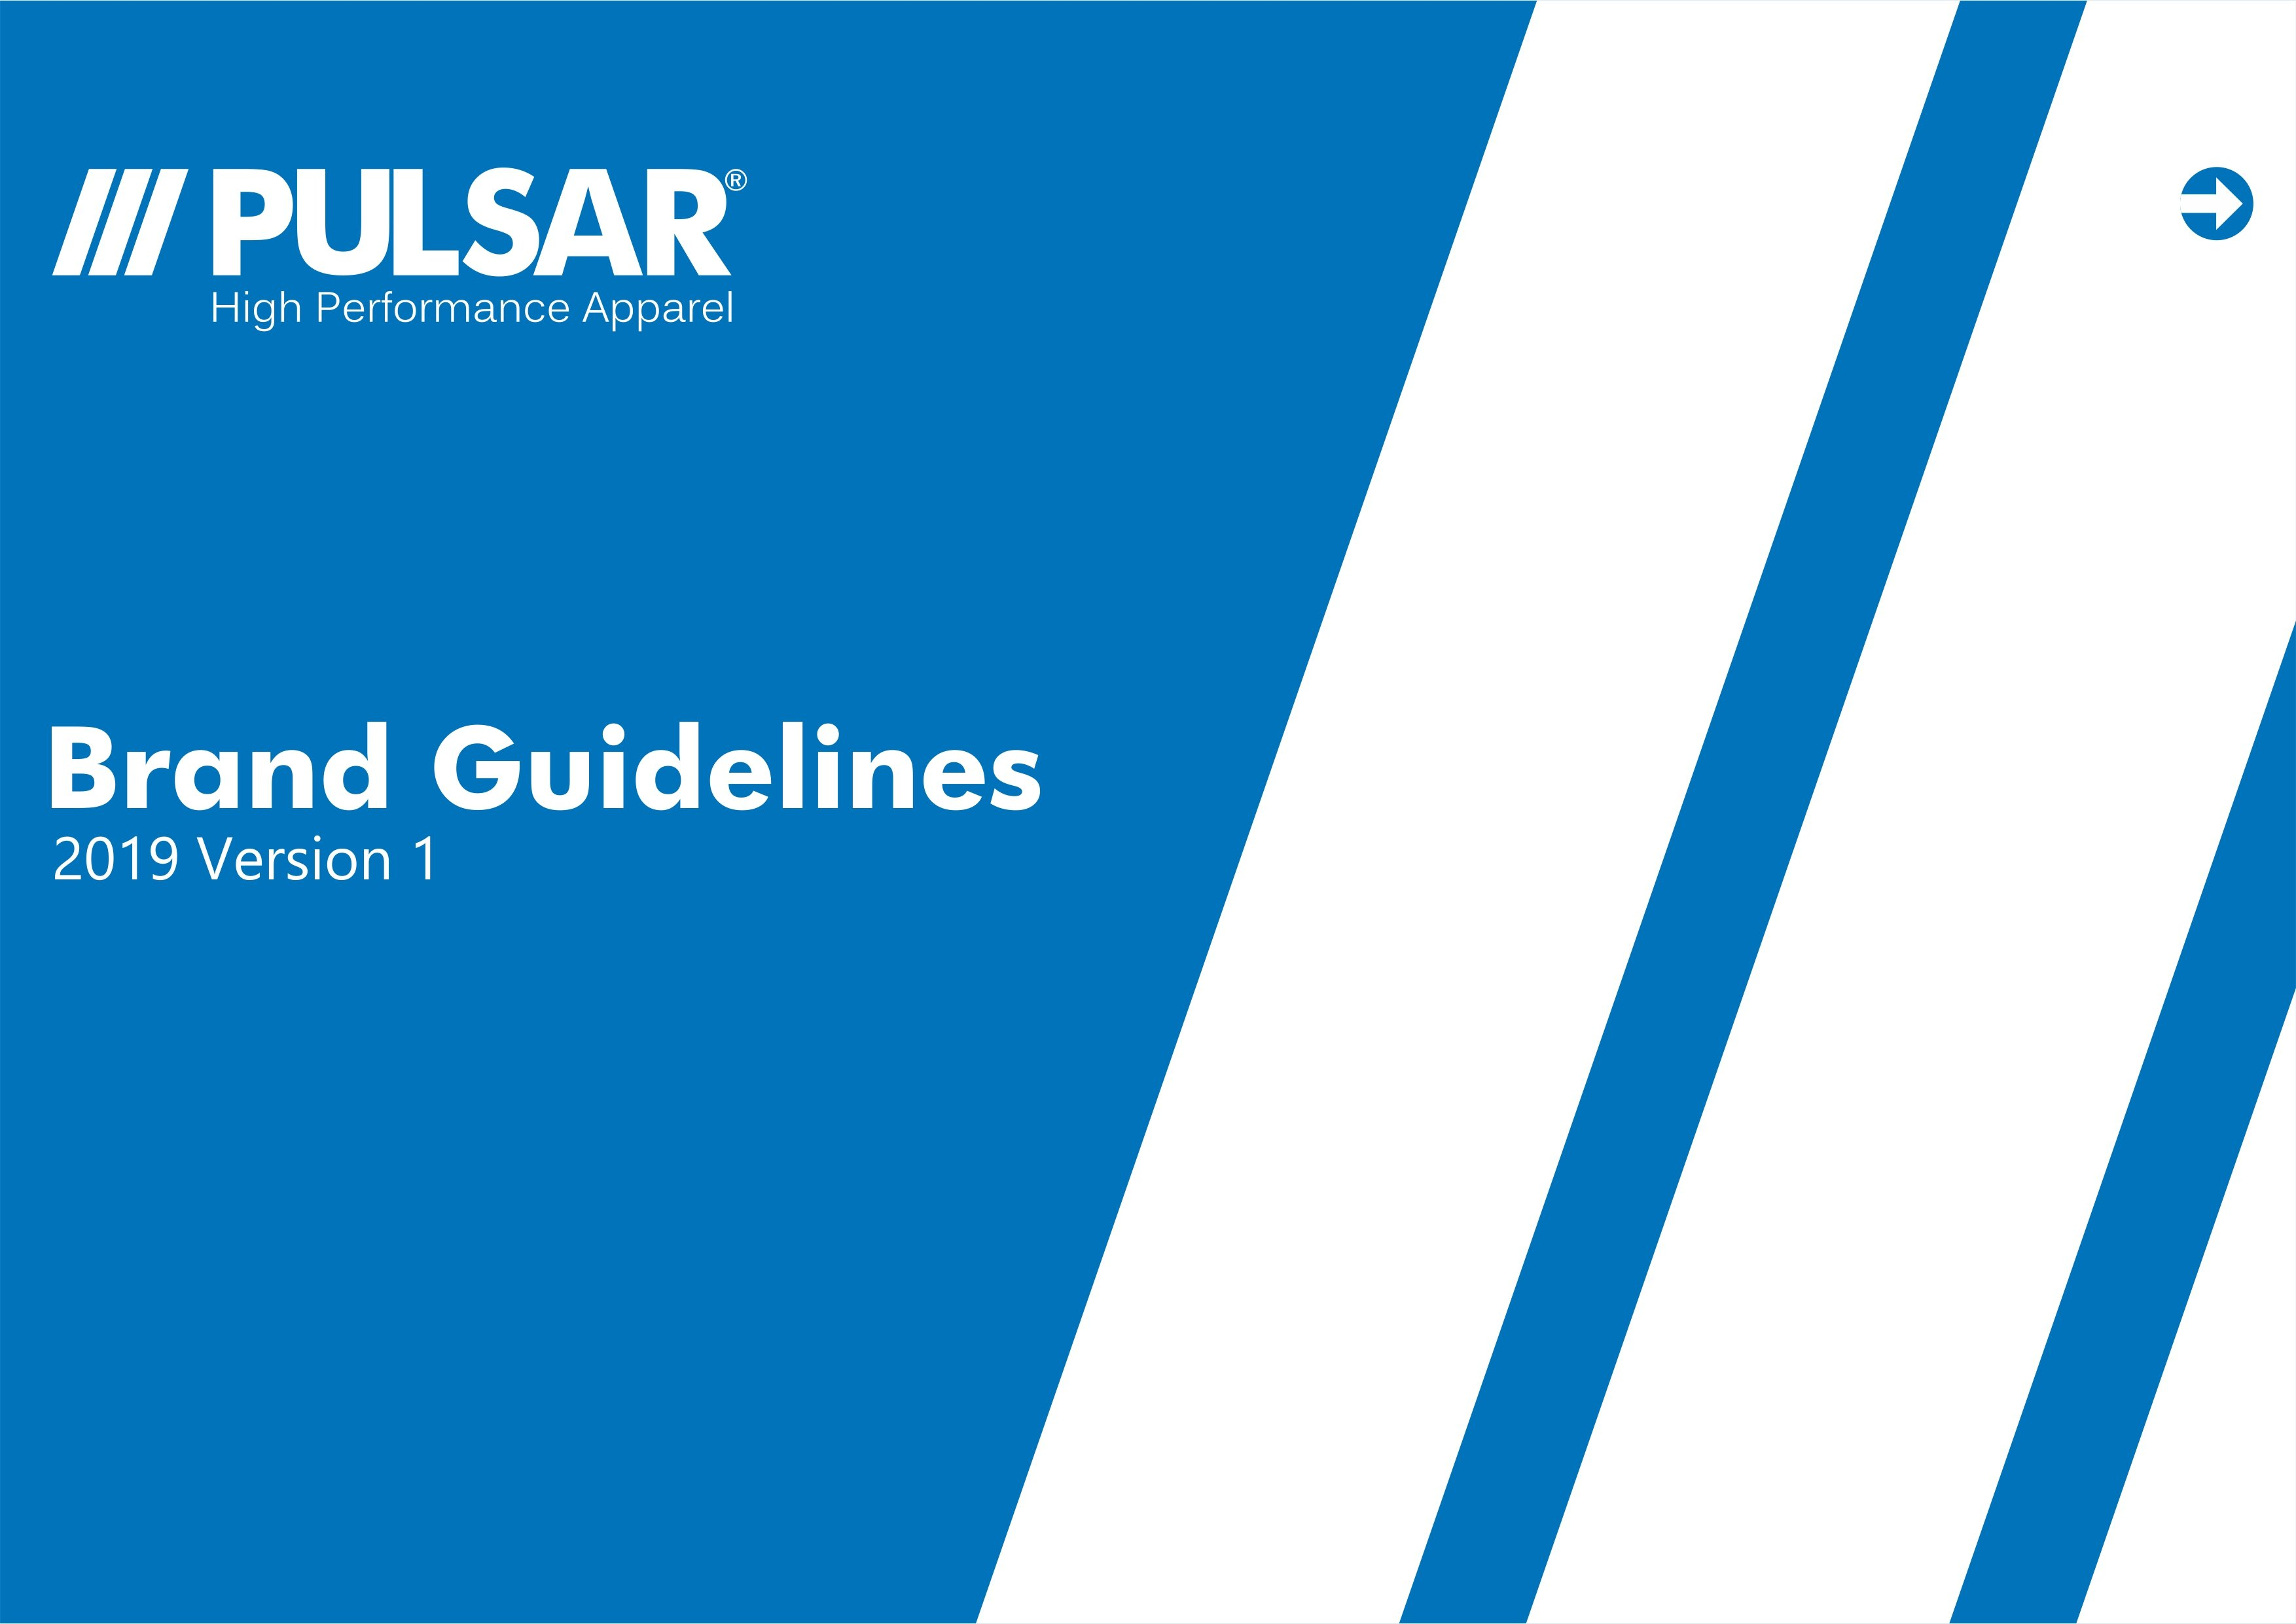 PULSAR® BRANDING GUIDELINES 2019